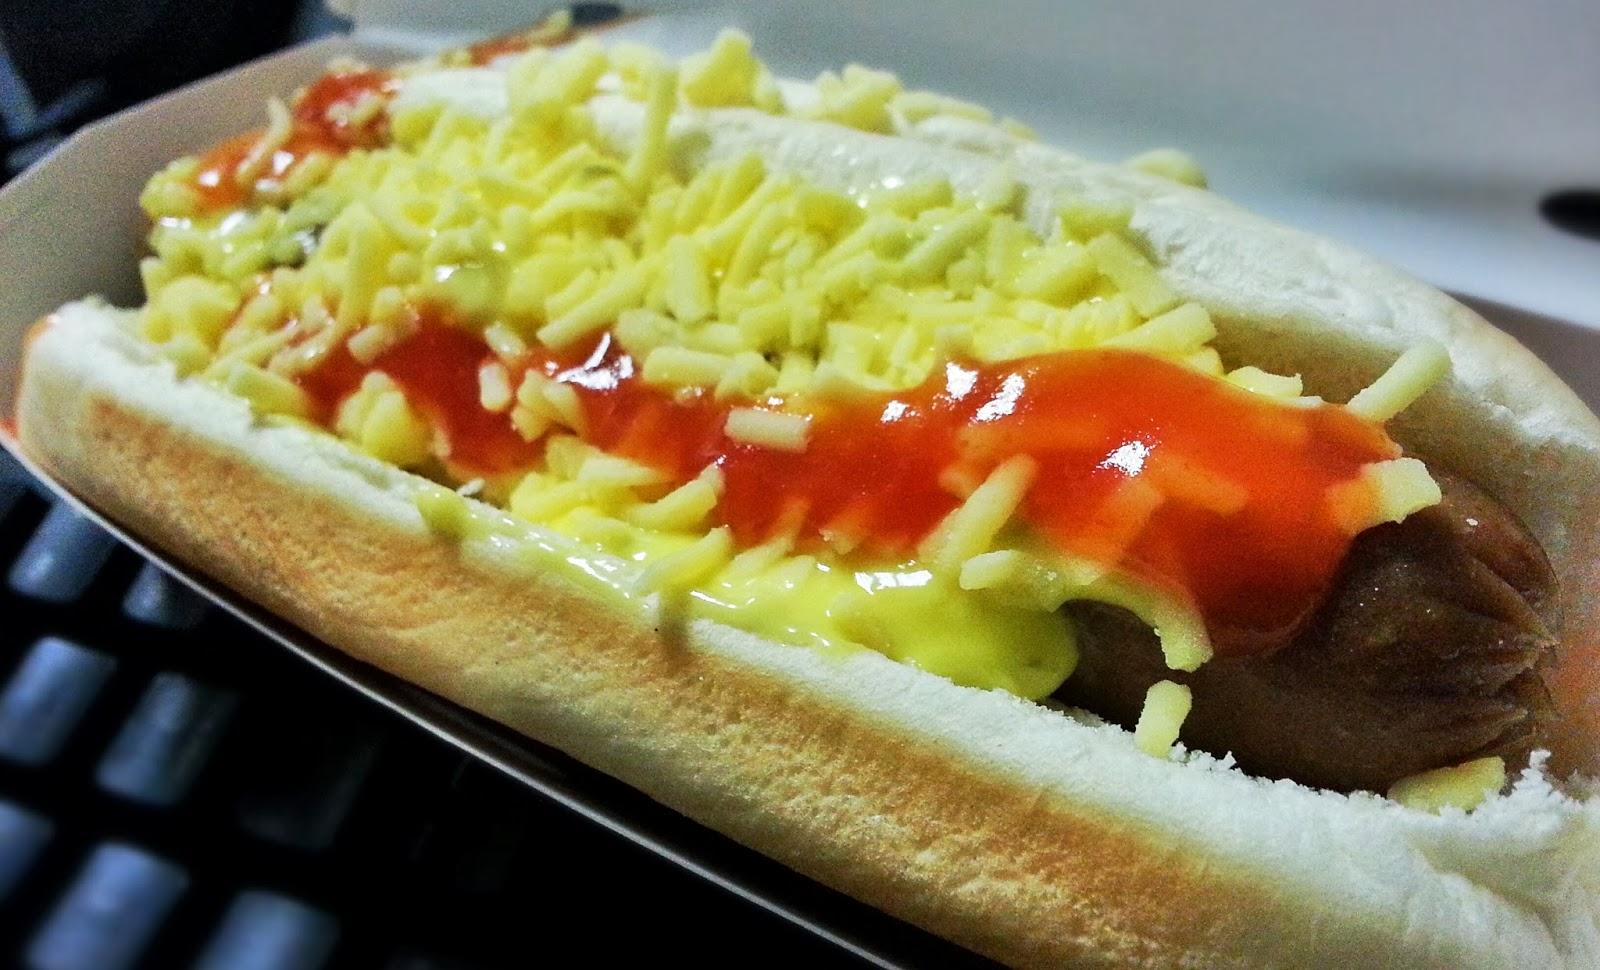 Jollibee's Jolly Hotdog